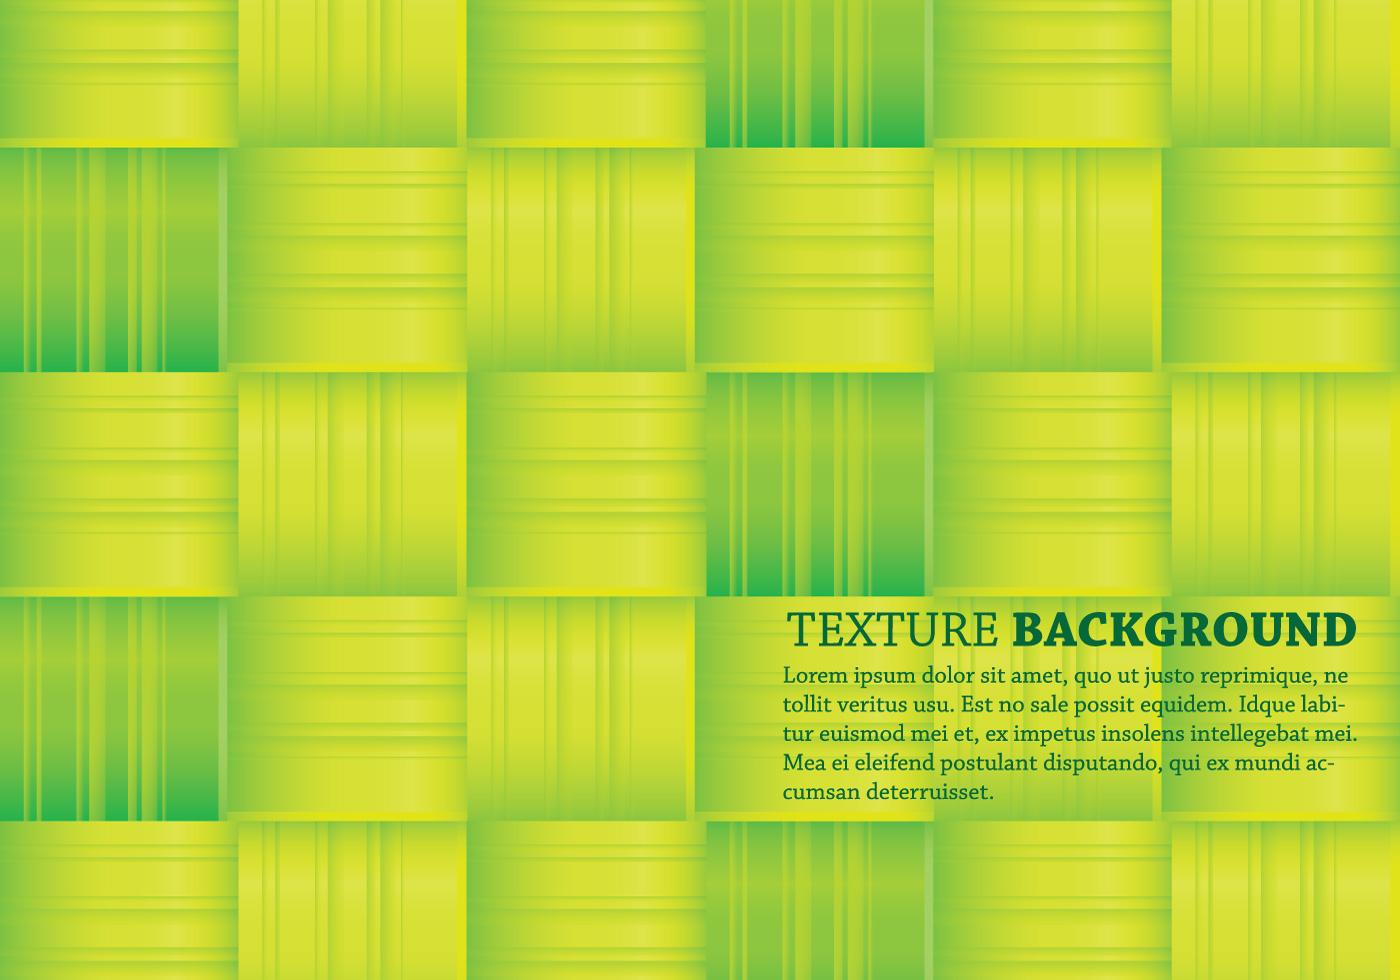 Ketupat Texture - Download Free Vector Art, Stock Graphics & Images